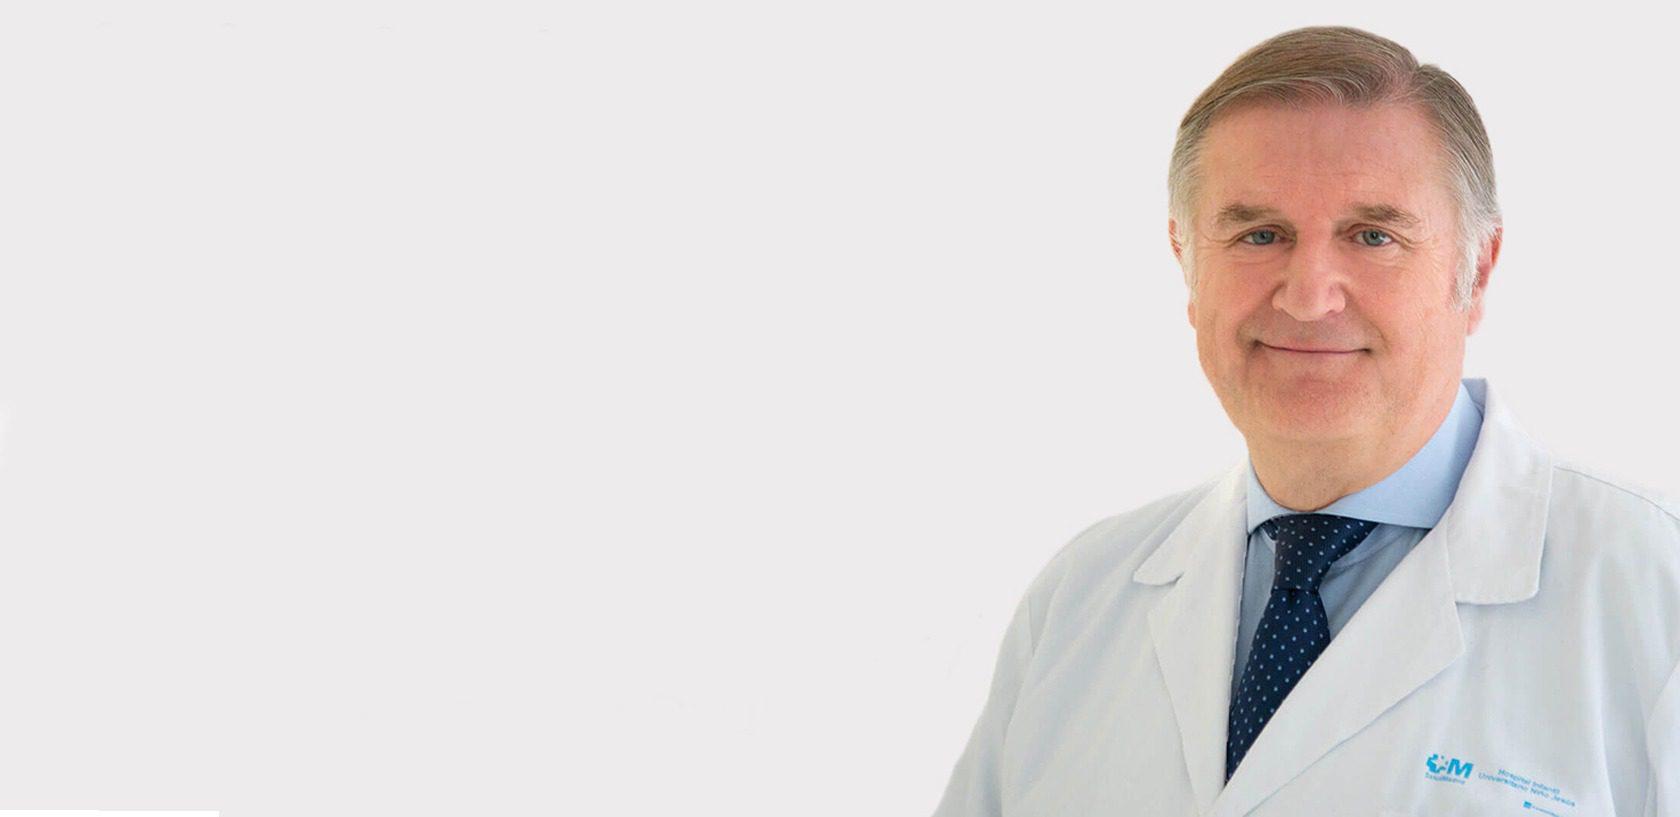 Dr. Luís Madero